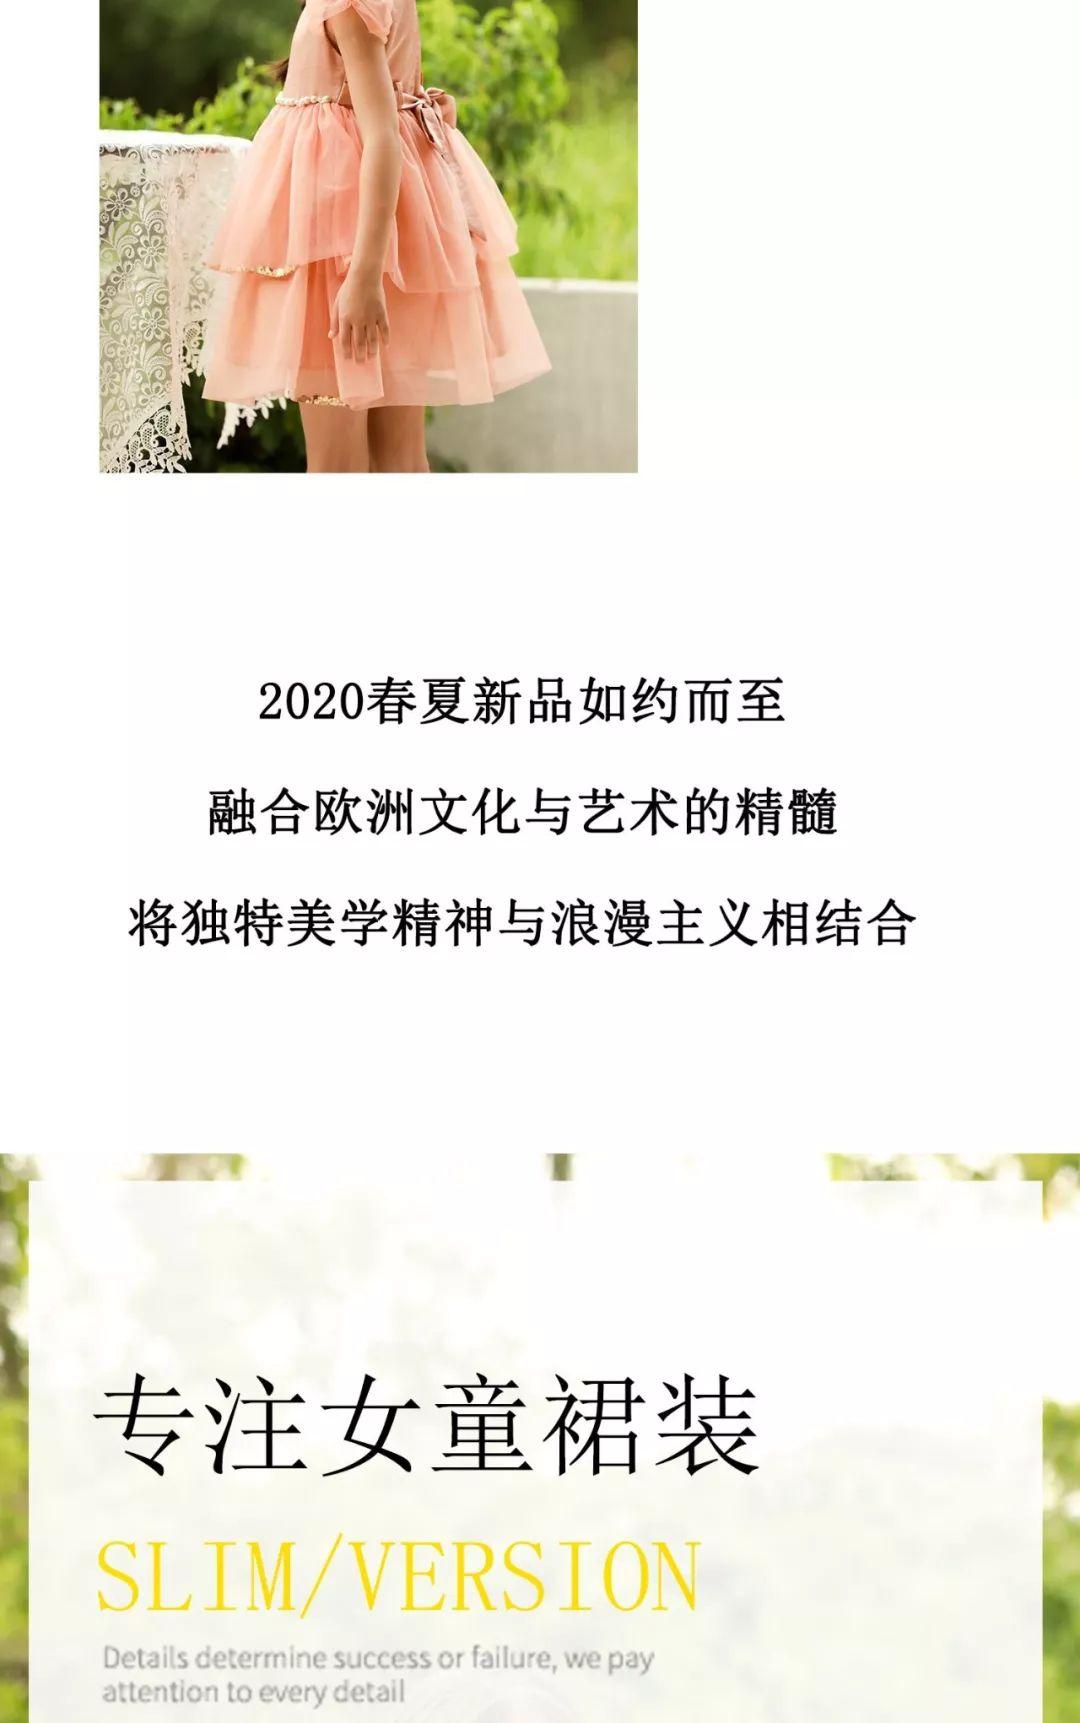 ceicei熙熙 | 2020SPRING春季新品如约而至